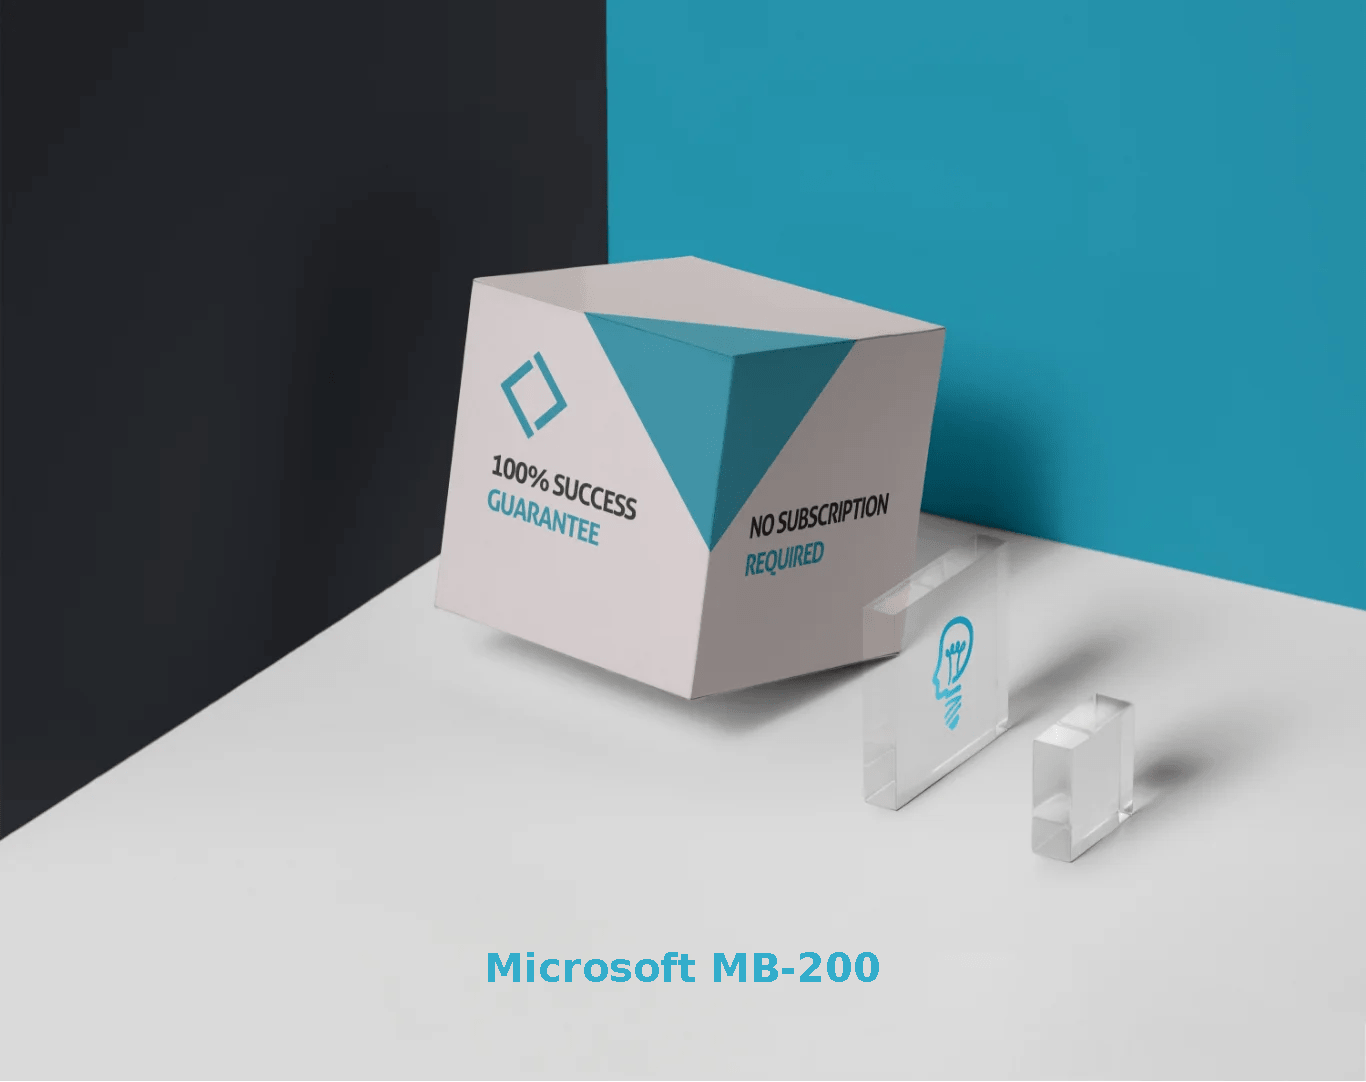 Microsoft MB-200 Exams